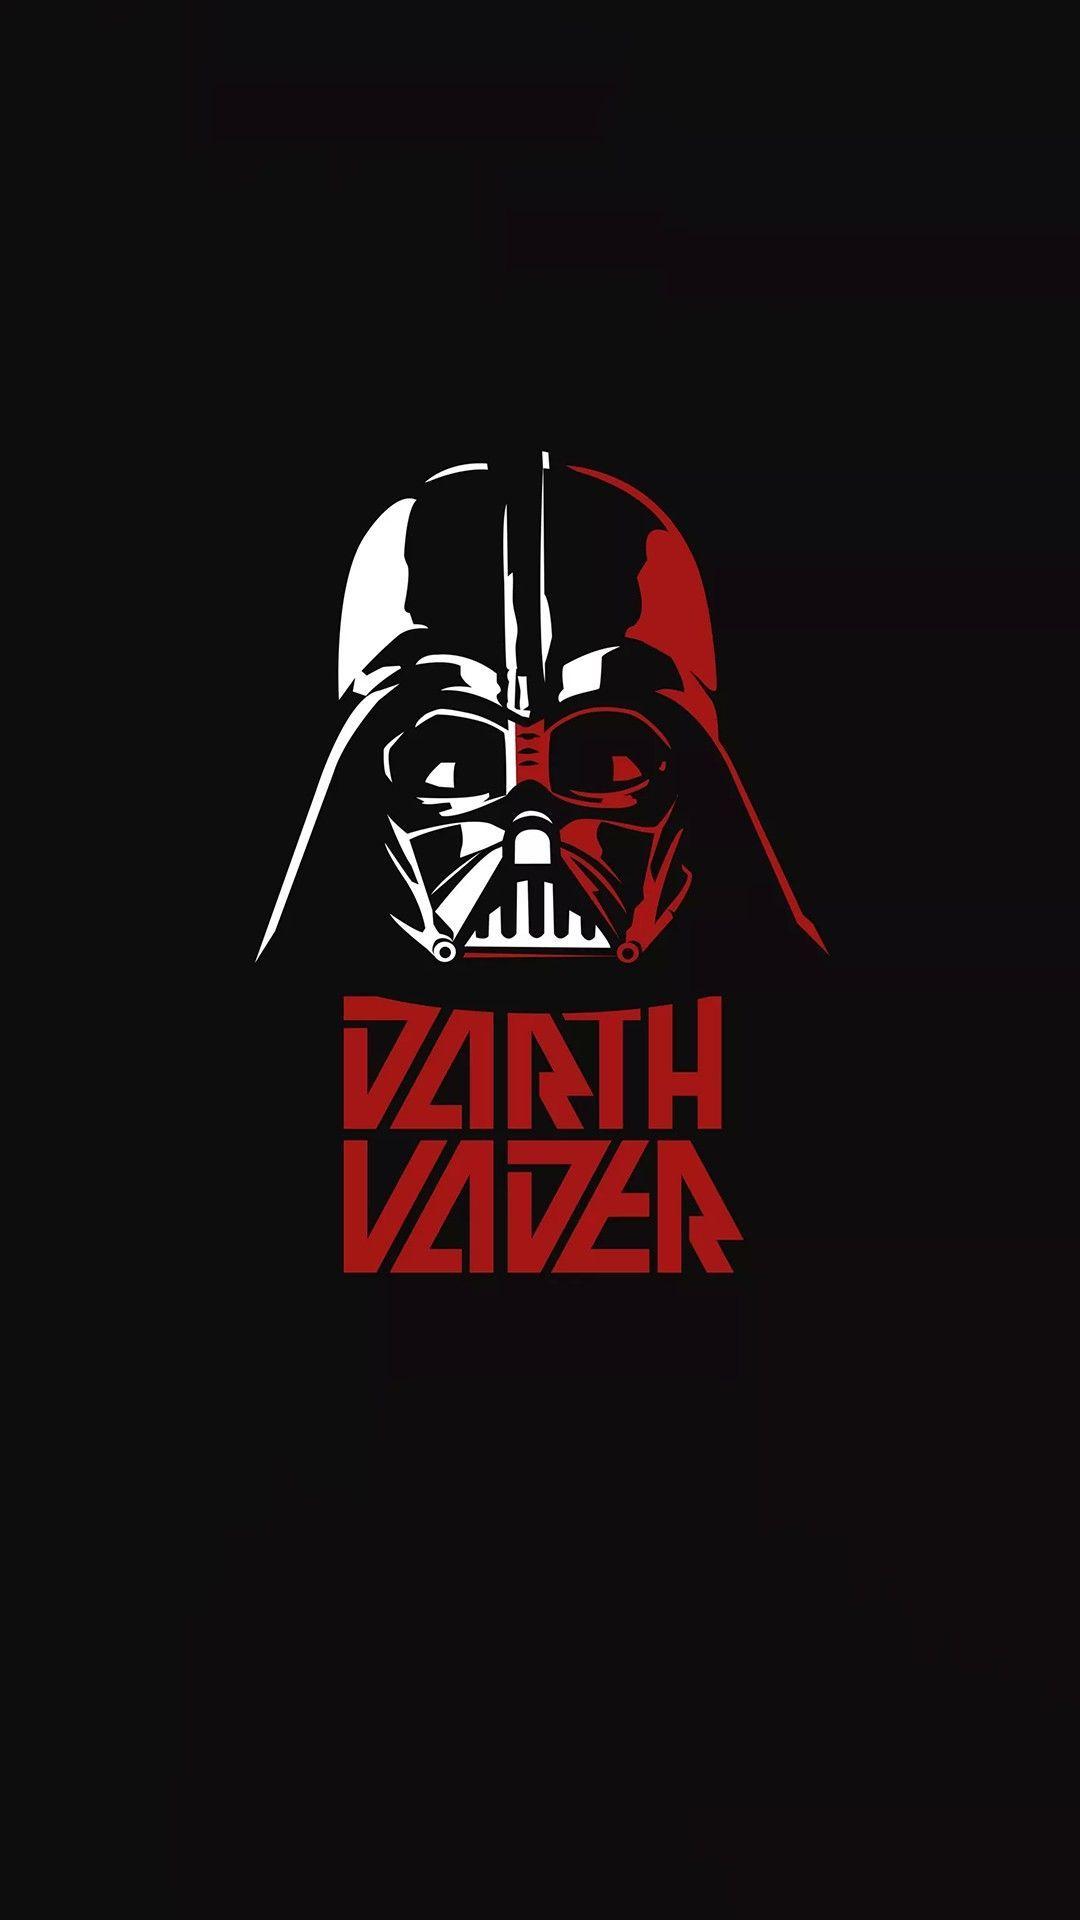 Mandalorian Emblem Wallpaper Ios In 2020 Star Wars Wallpaper